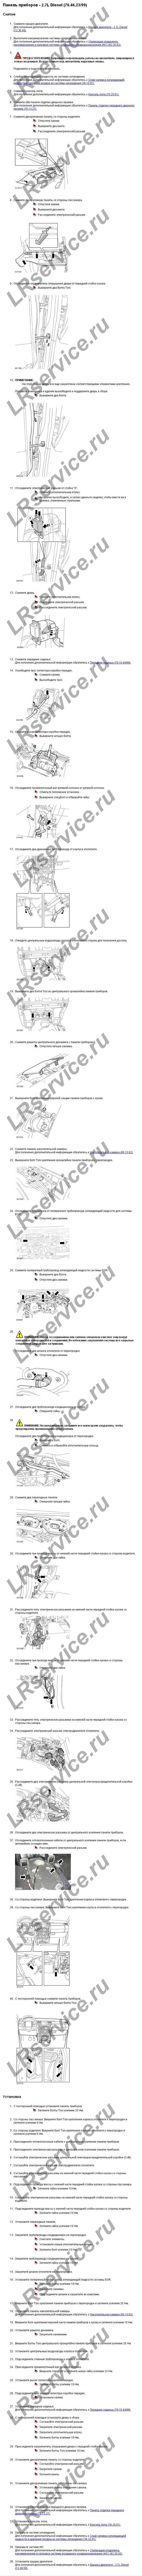 Снятие приборной панели Land Rover Discovery 3